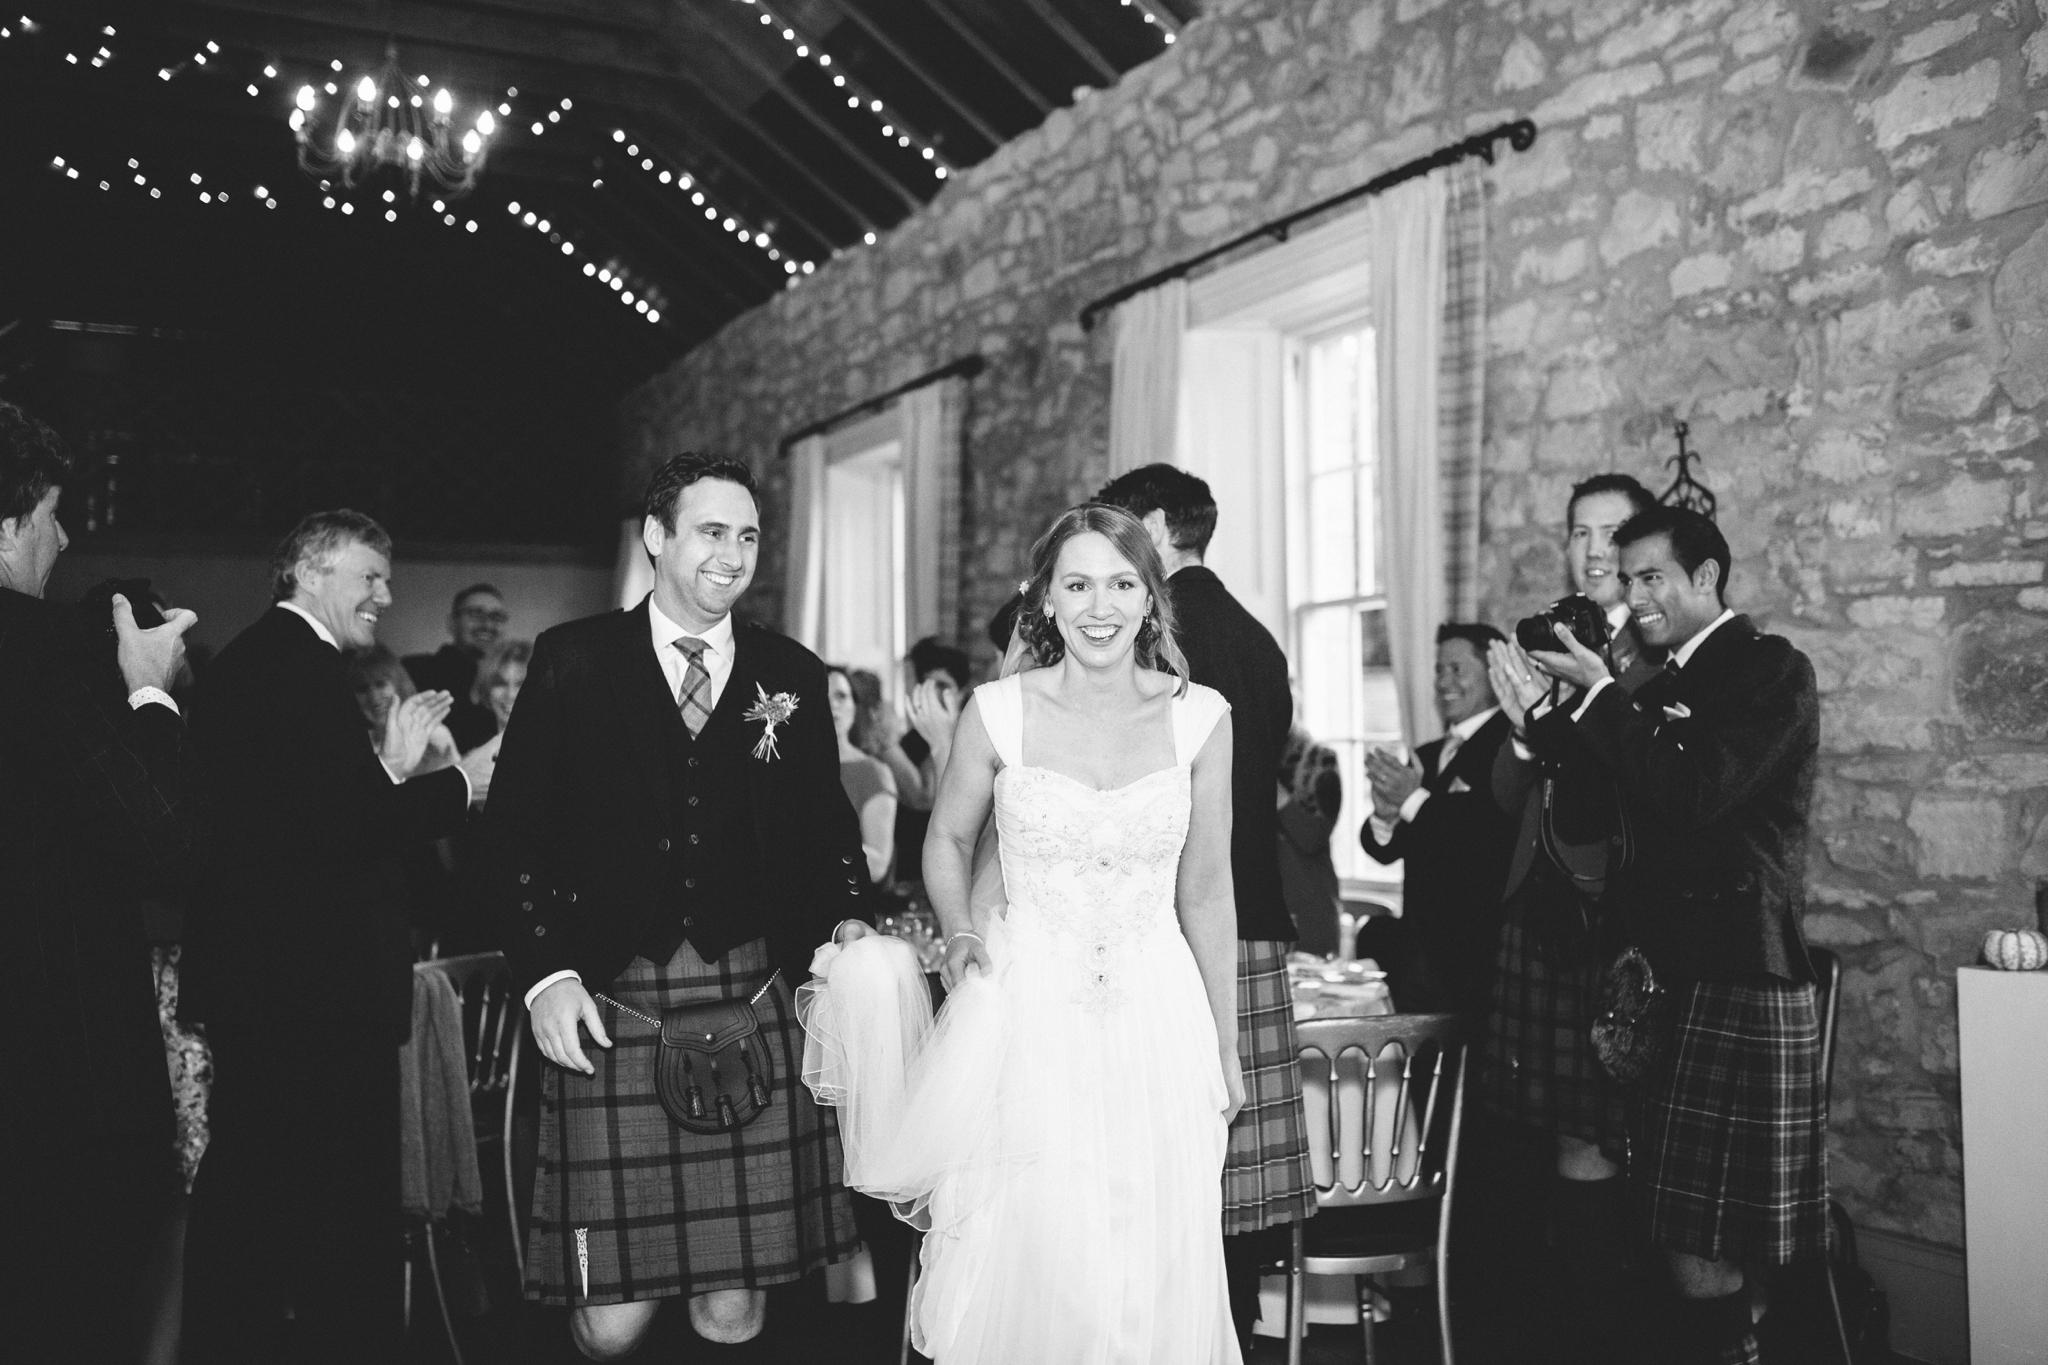 Suzanne_li_photography_kirknewton_wedding_0057.jpg